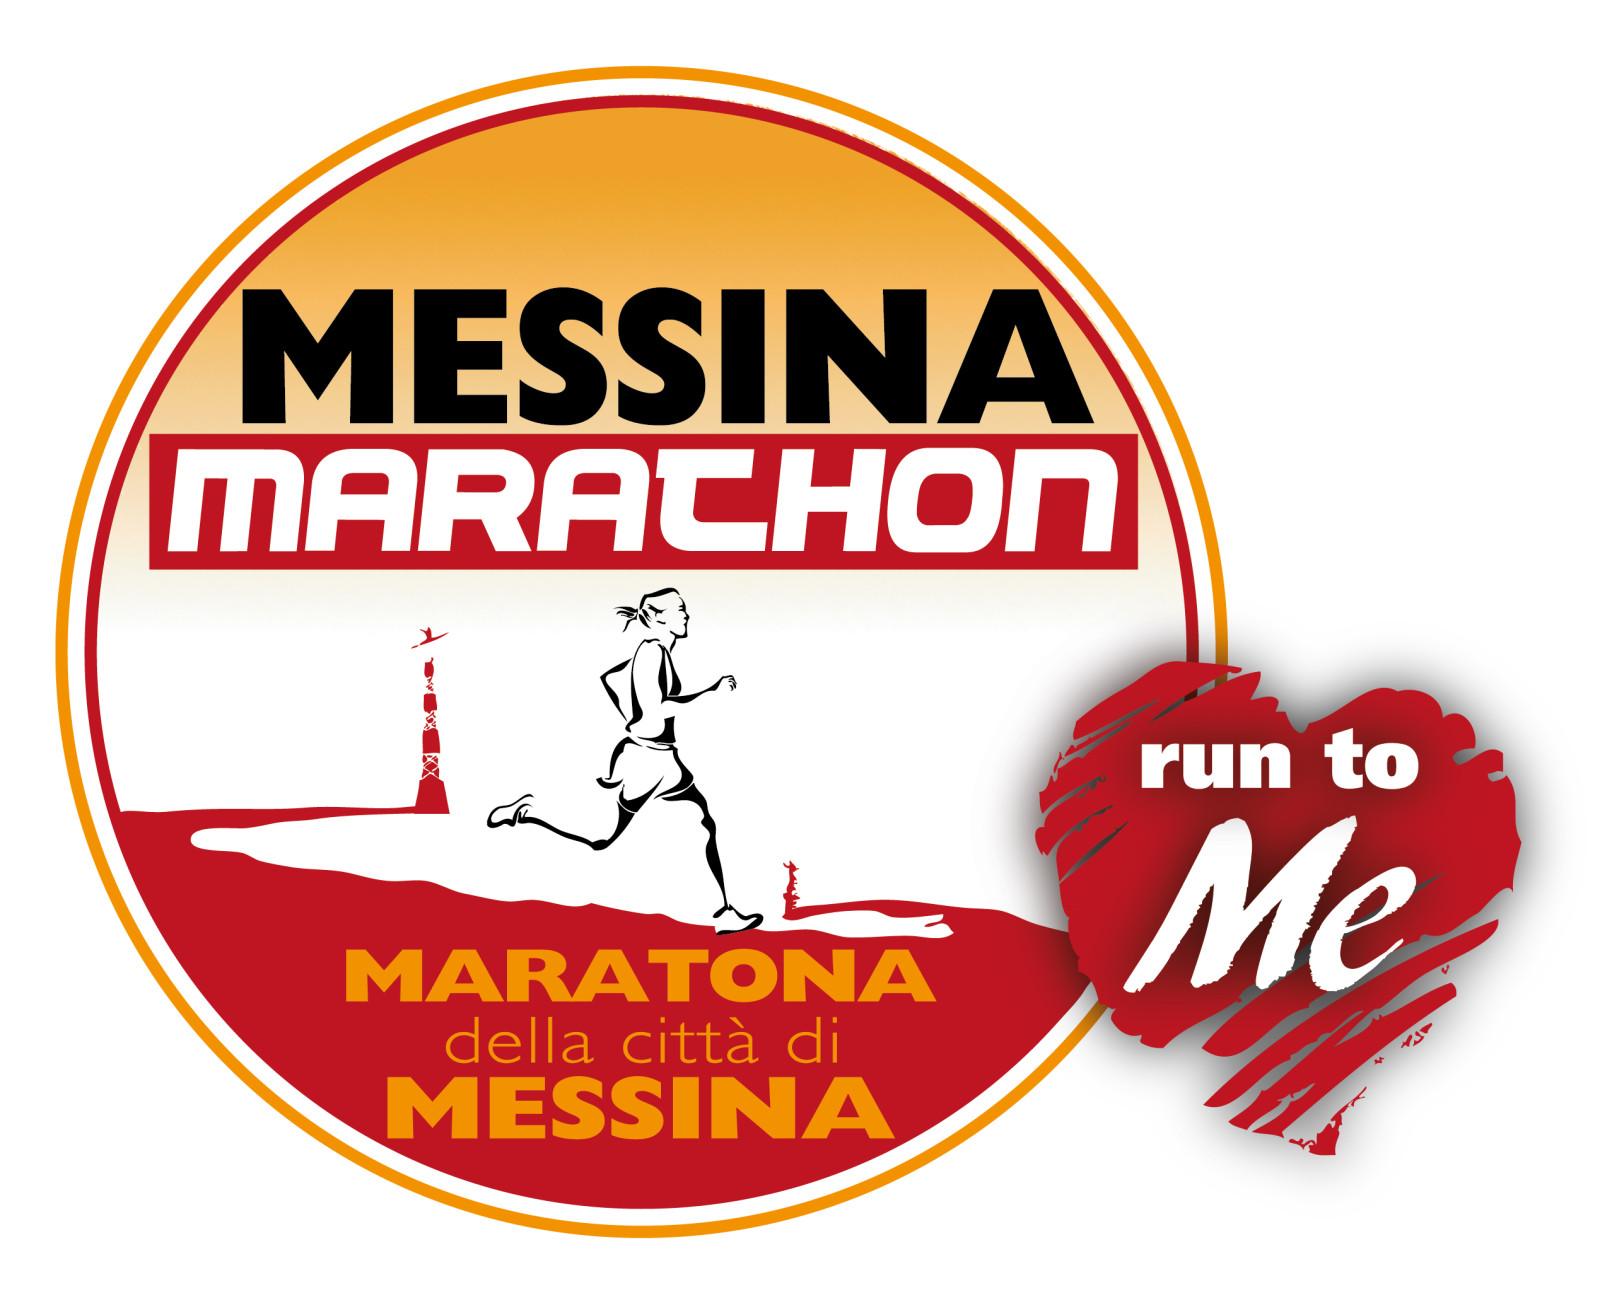 messina-marathon